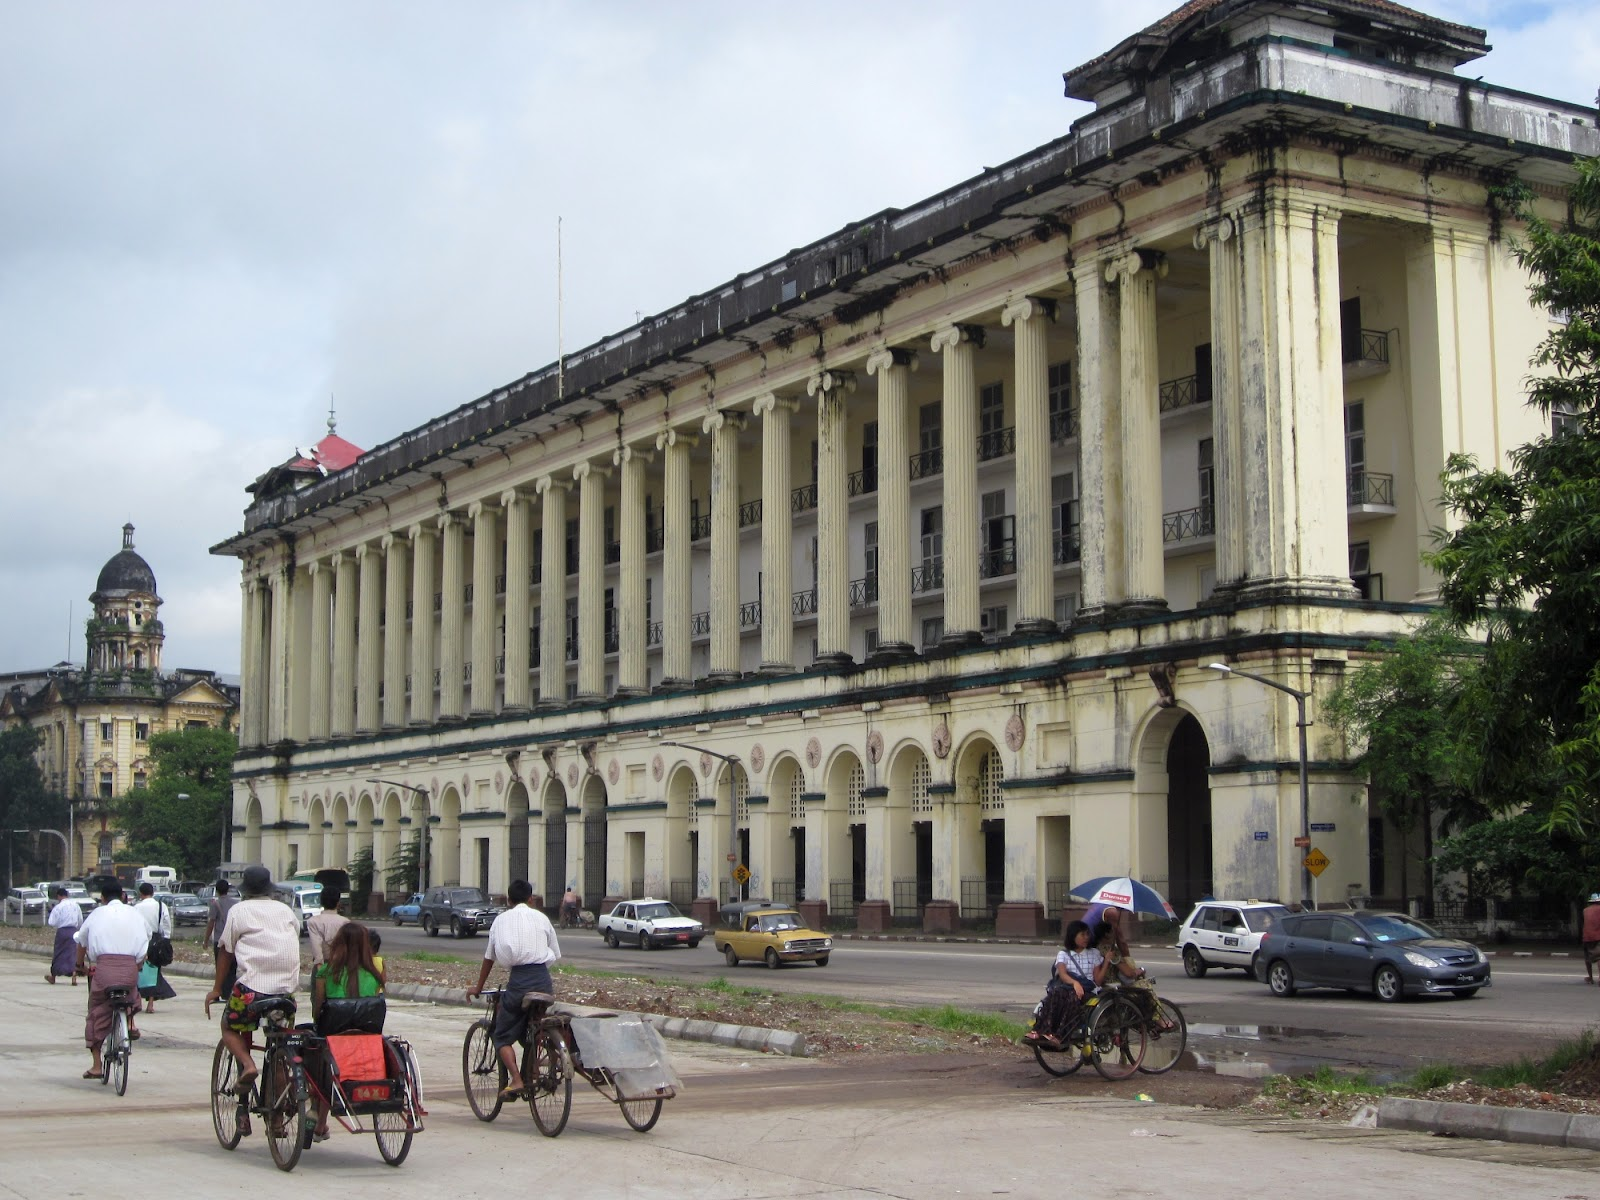 sofaer co building yangon grey sofa beige walls travel and adventures myanmar burma a voyage to